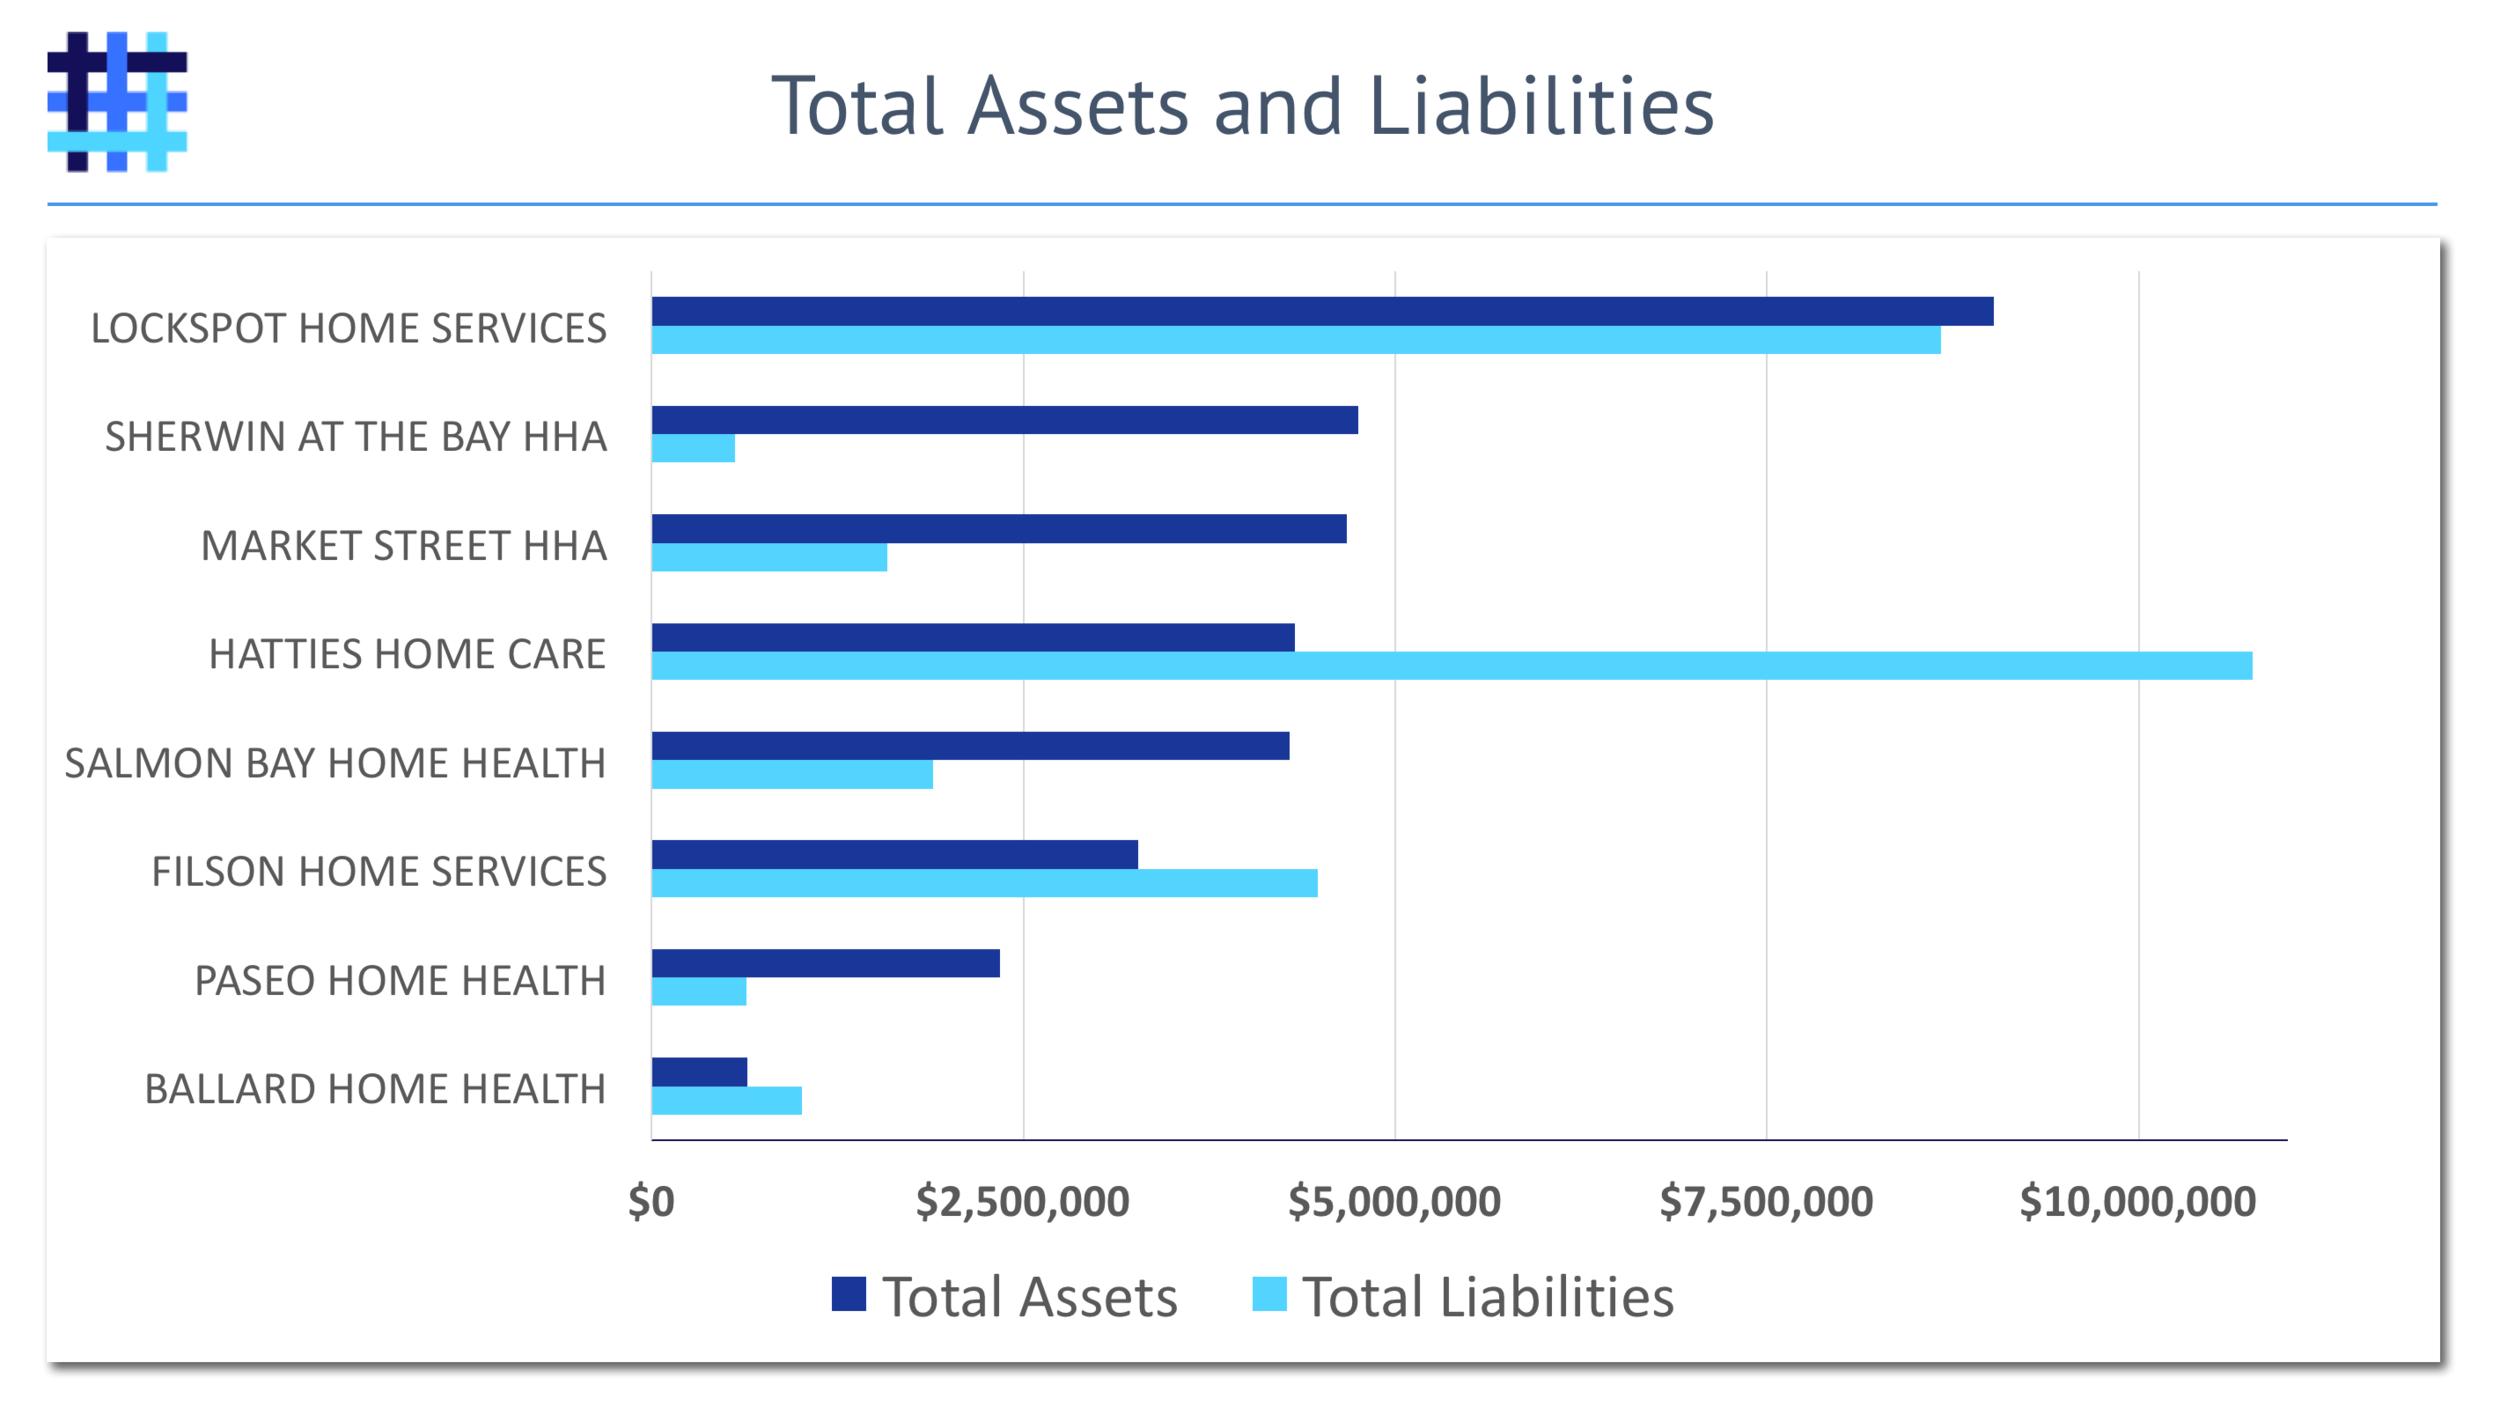 home-health-agency-hha-assets-liabilities